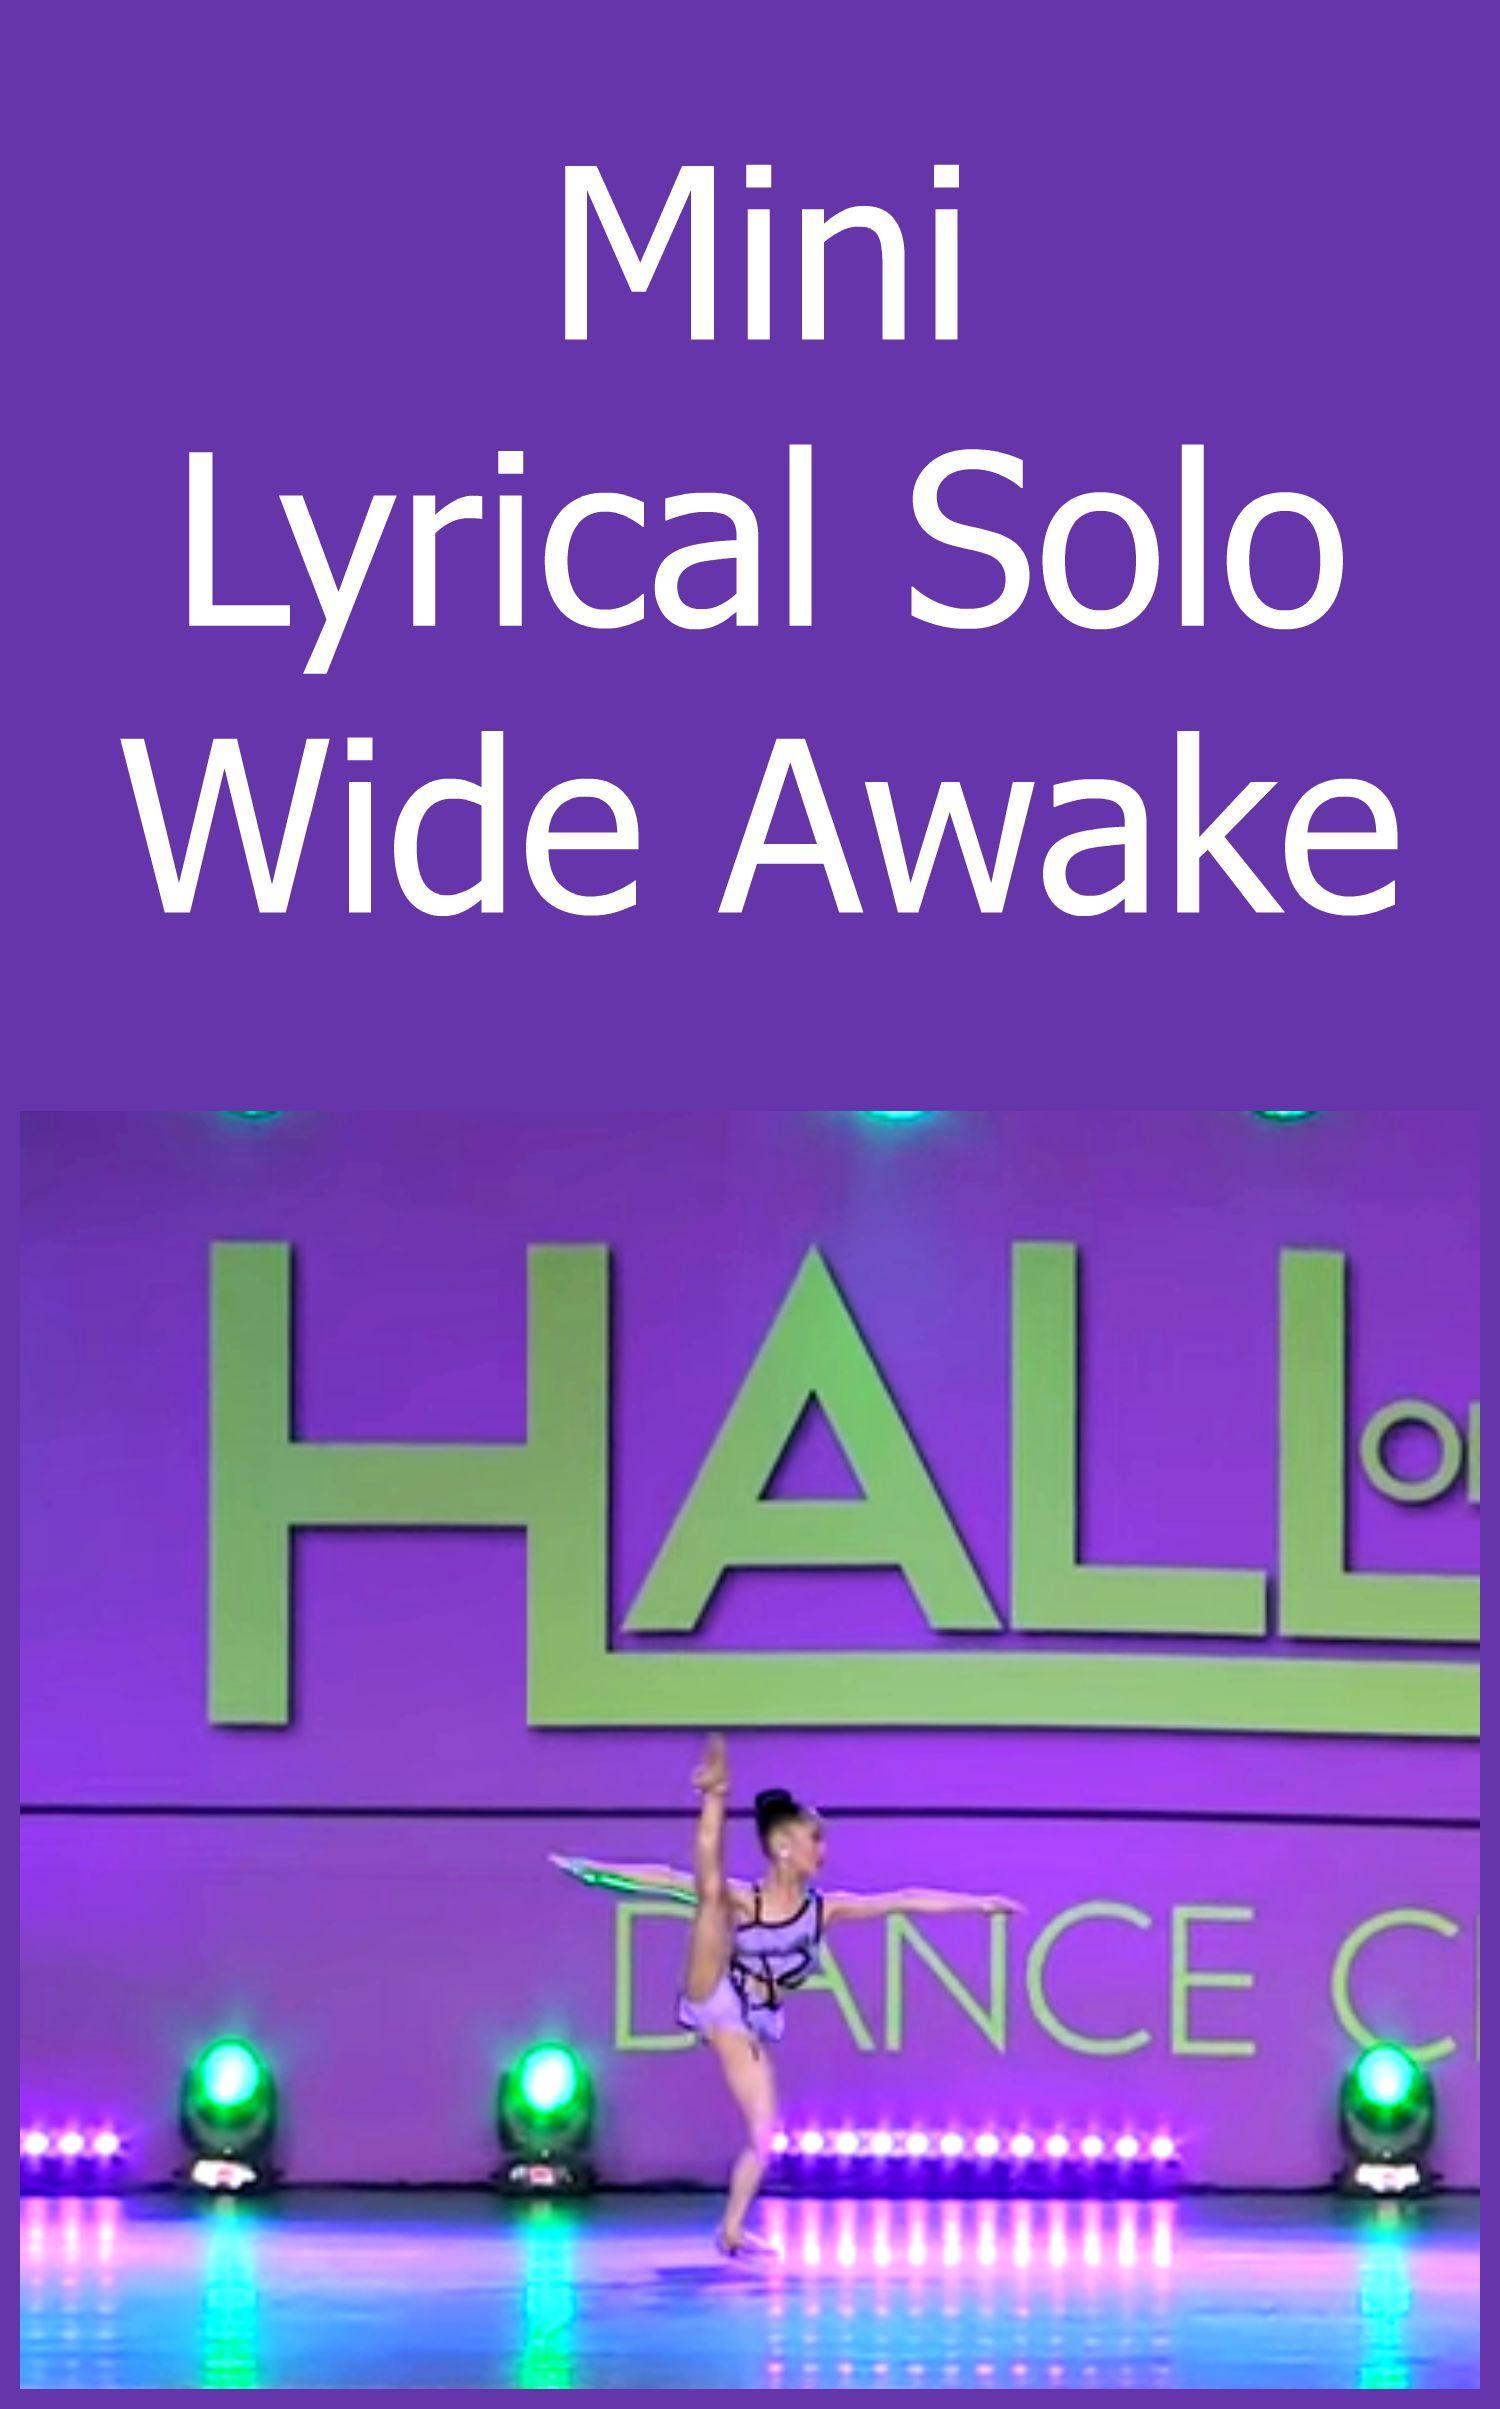 Mini+lyrical+solo+-+Calico+Reyes+-+Wide+Awake